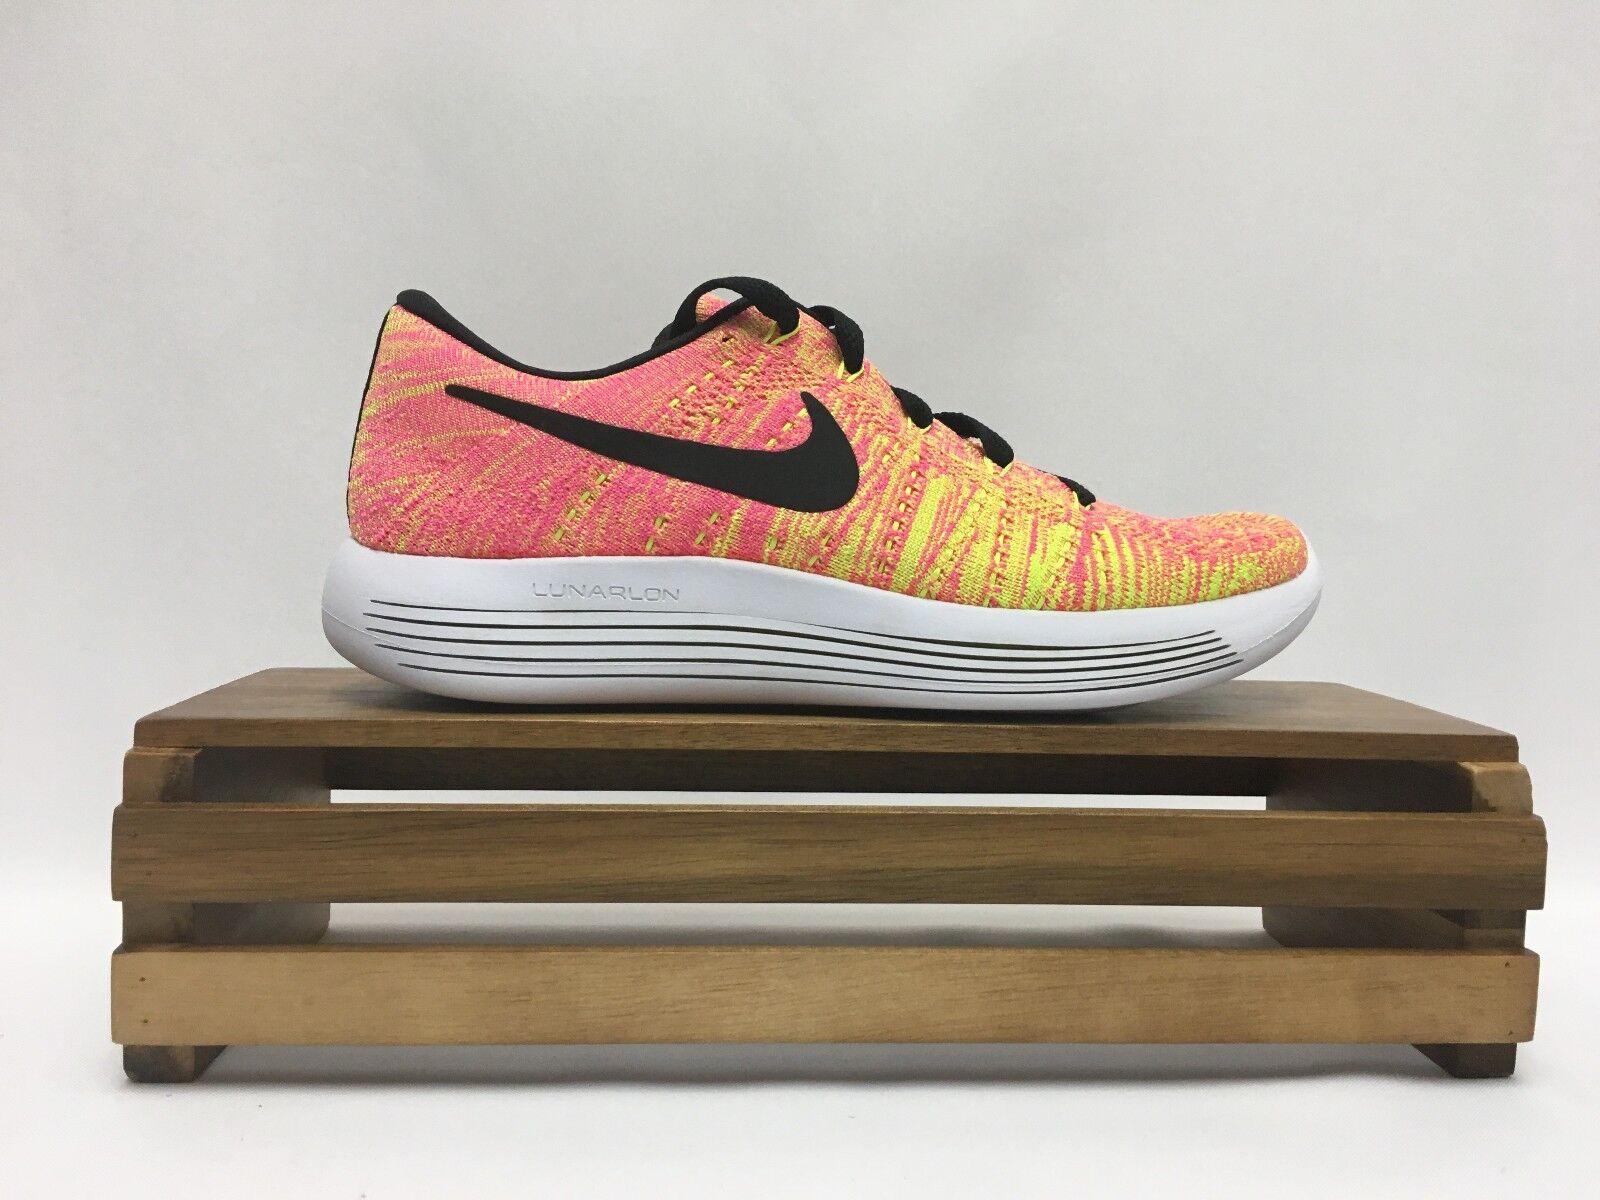 nike lunarepic faible flyknit oc chaussures orange jaune blanc 844863-999 new  's new 844863-999 914f51